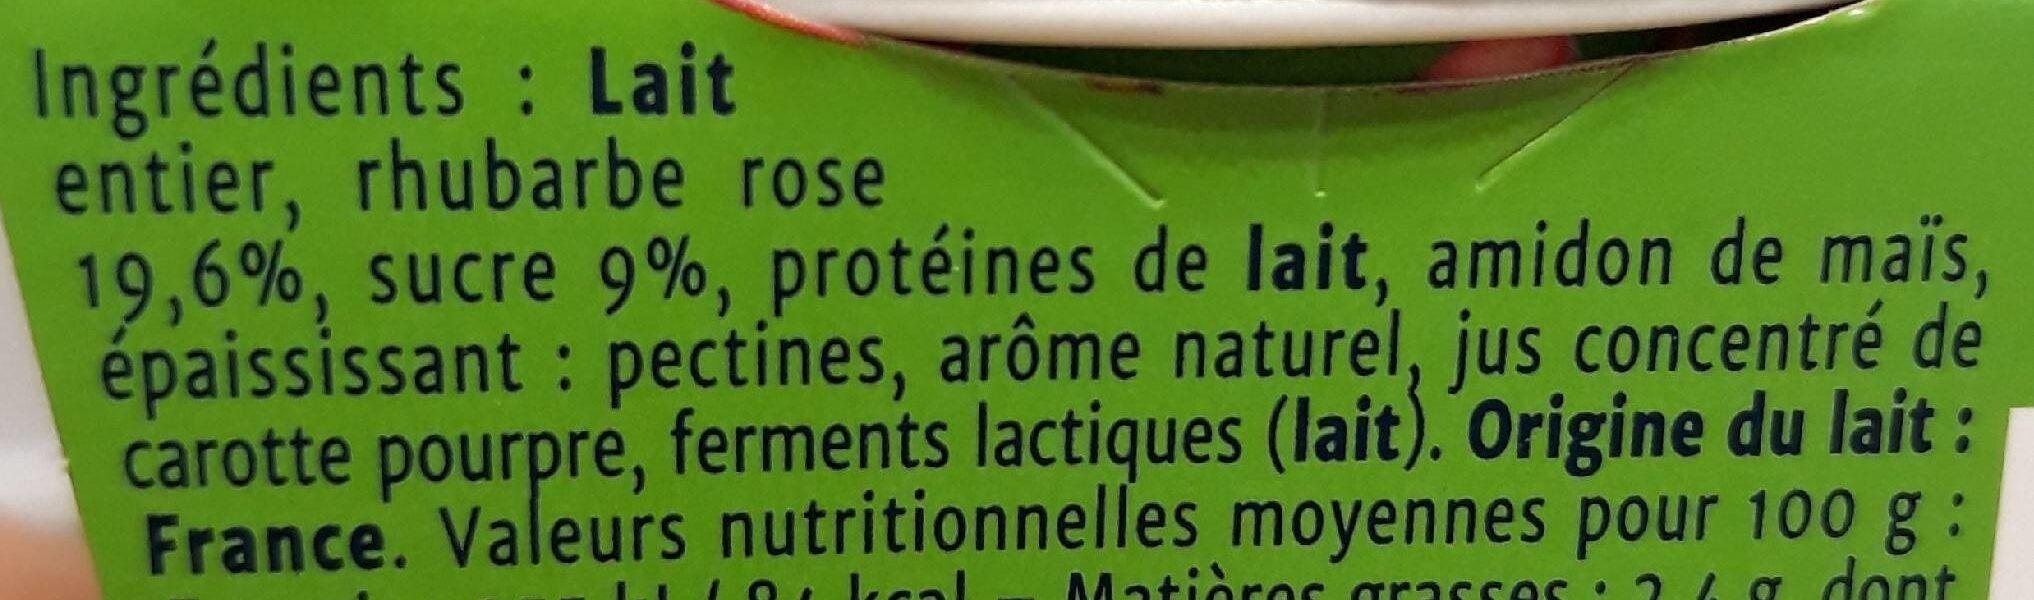 Gourmand® Yaourt Rhubarbe rose - Ingredients - fr